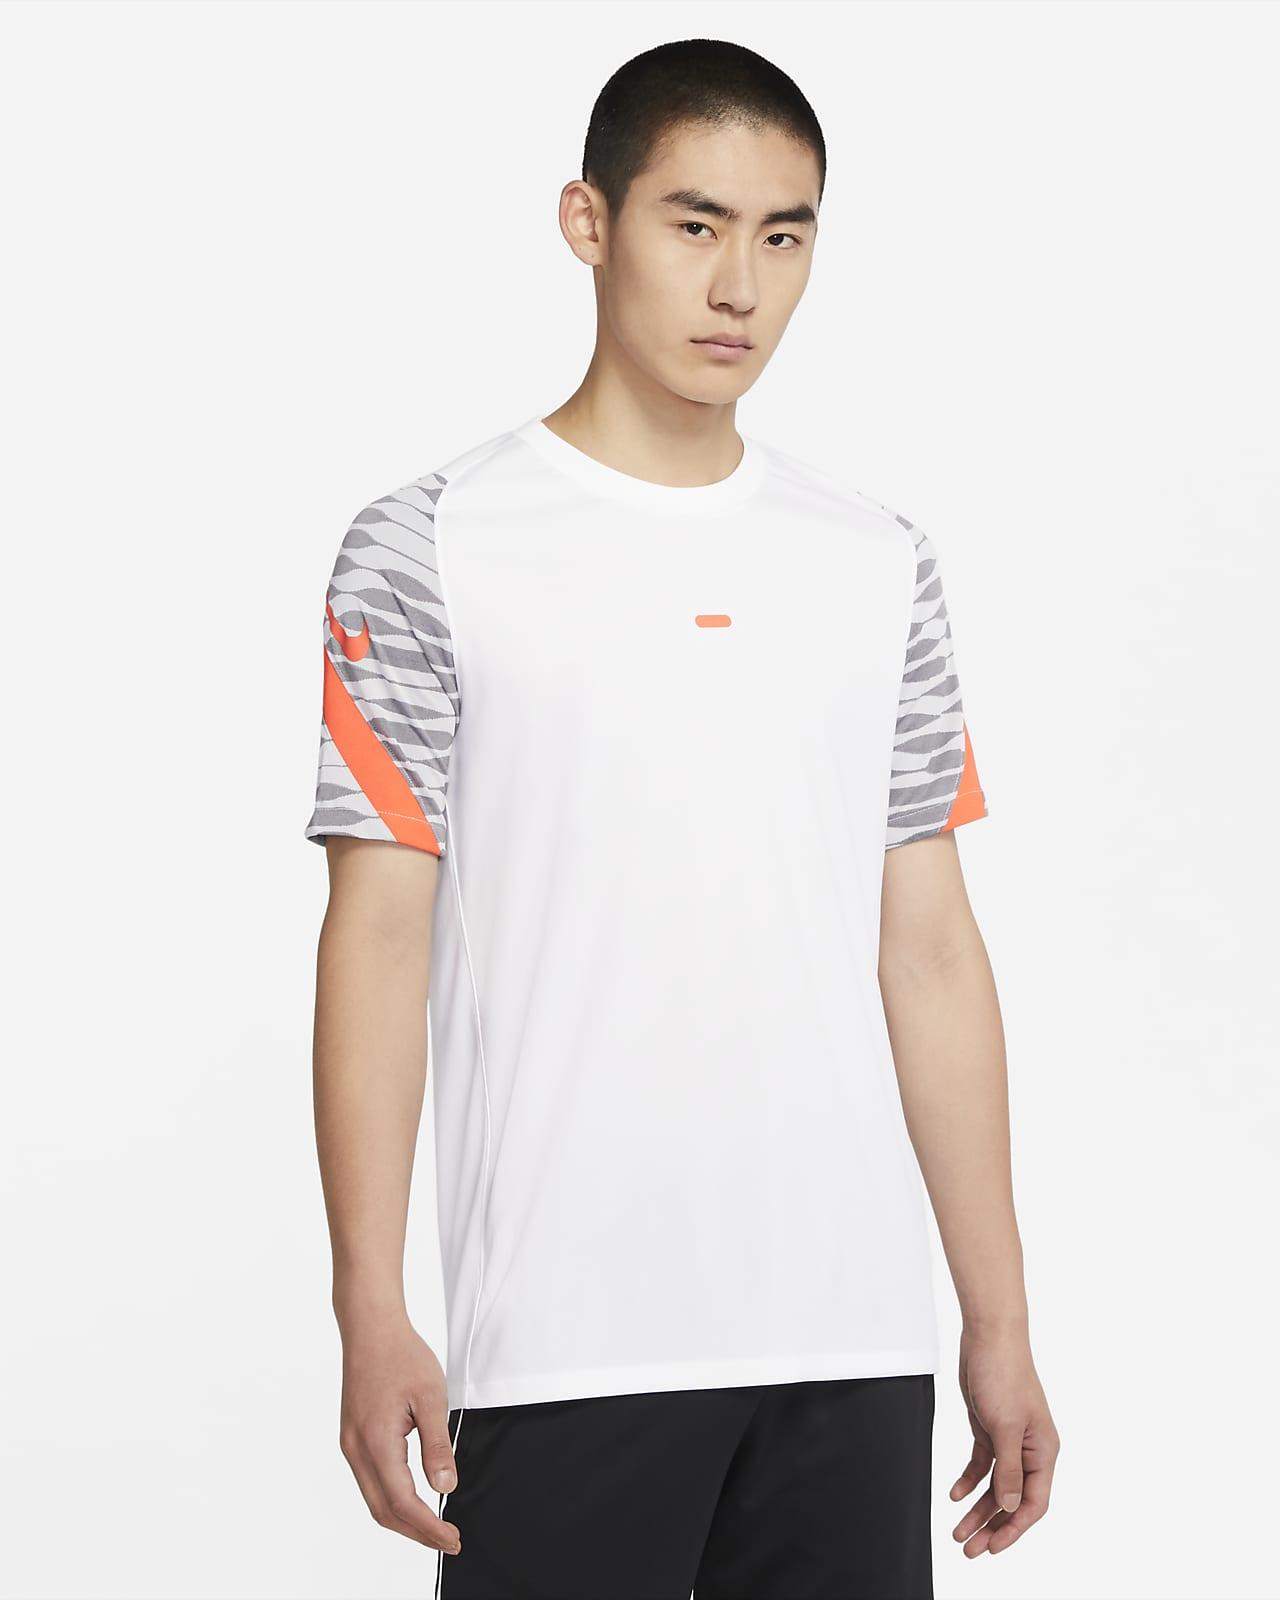 Nike Dri-FIT Strike Men's Short-Sleeve Soccer Top